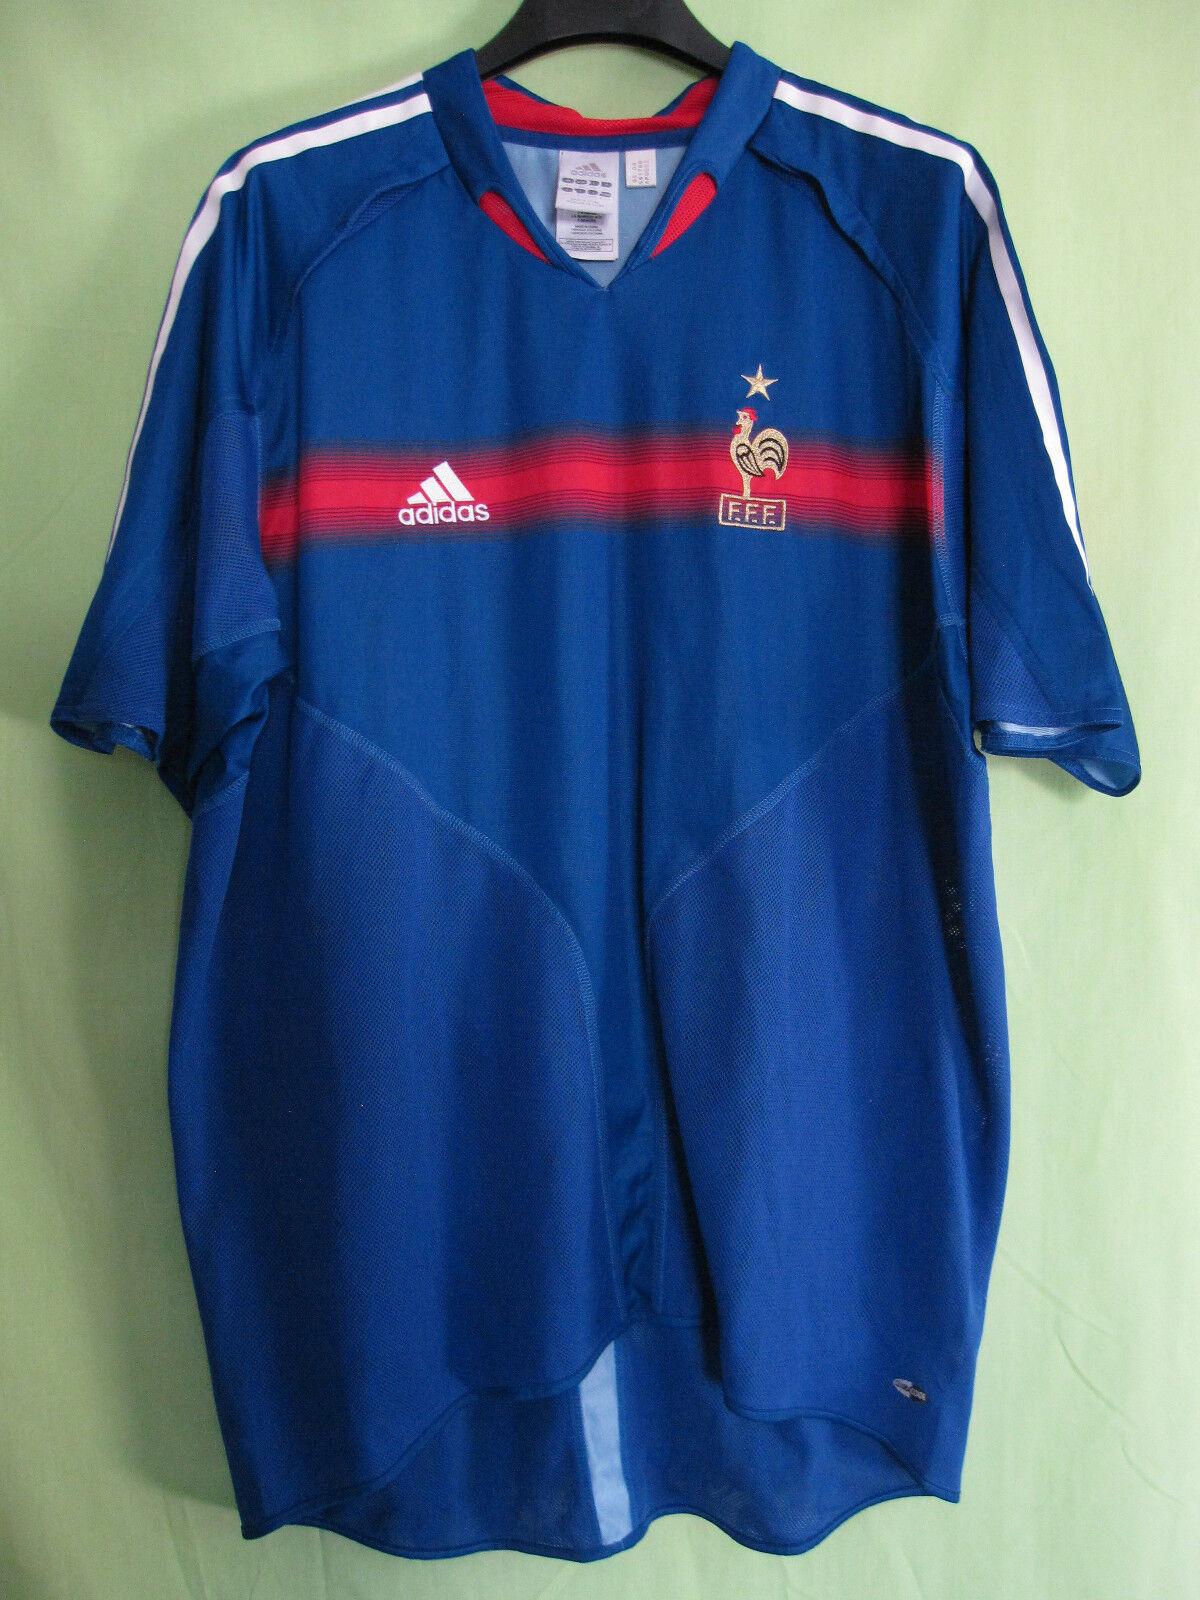 Maillot Equipe de France 2004 Vintage Adidas Jersey Football - XL